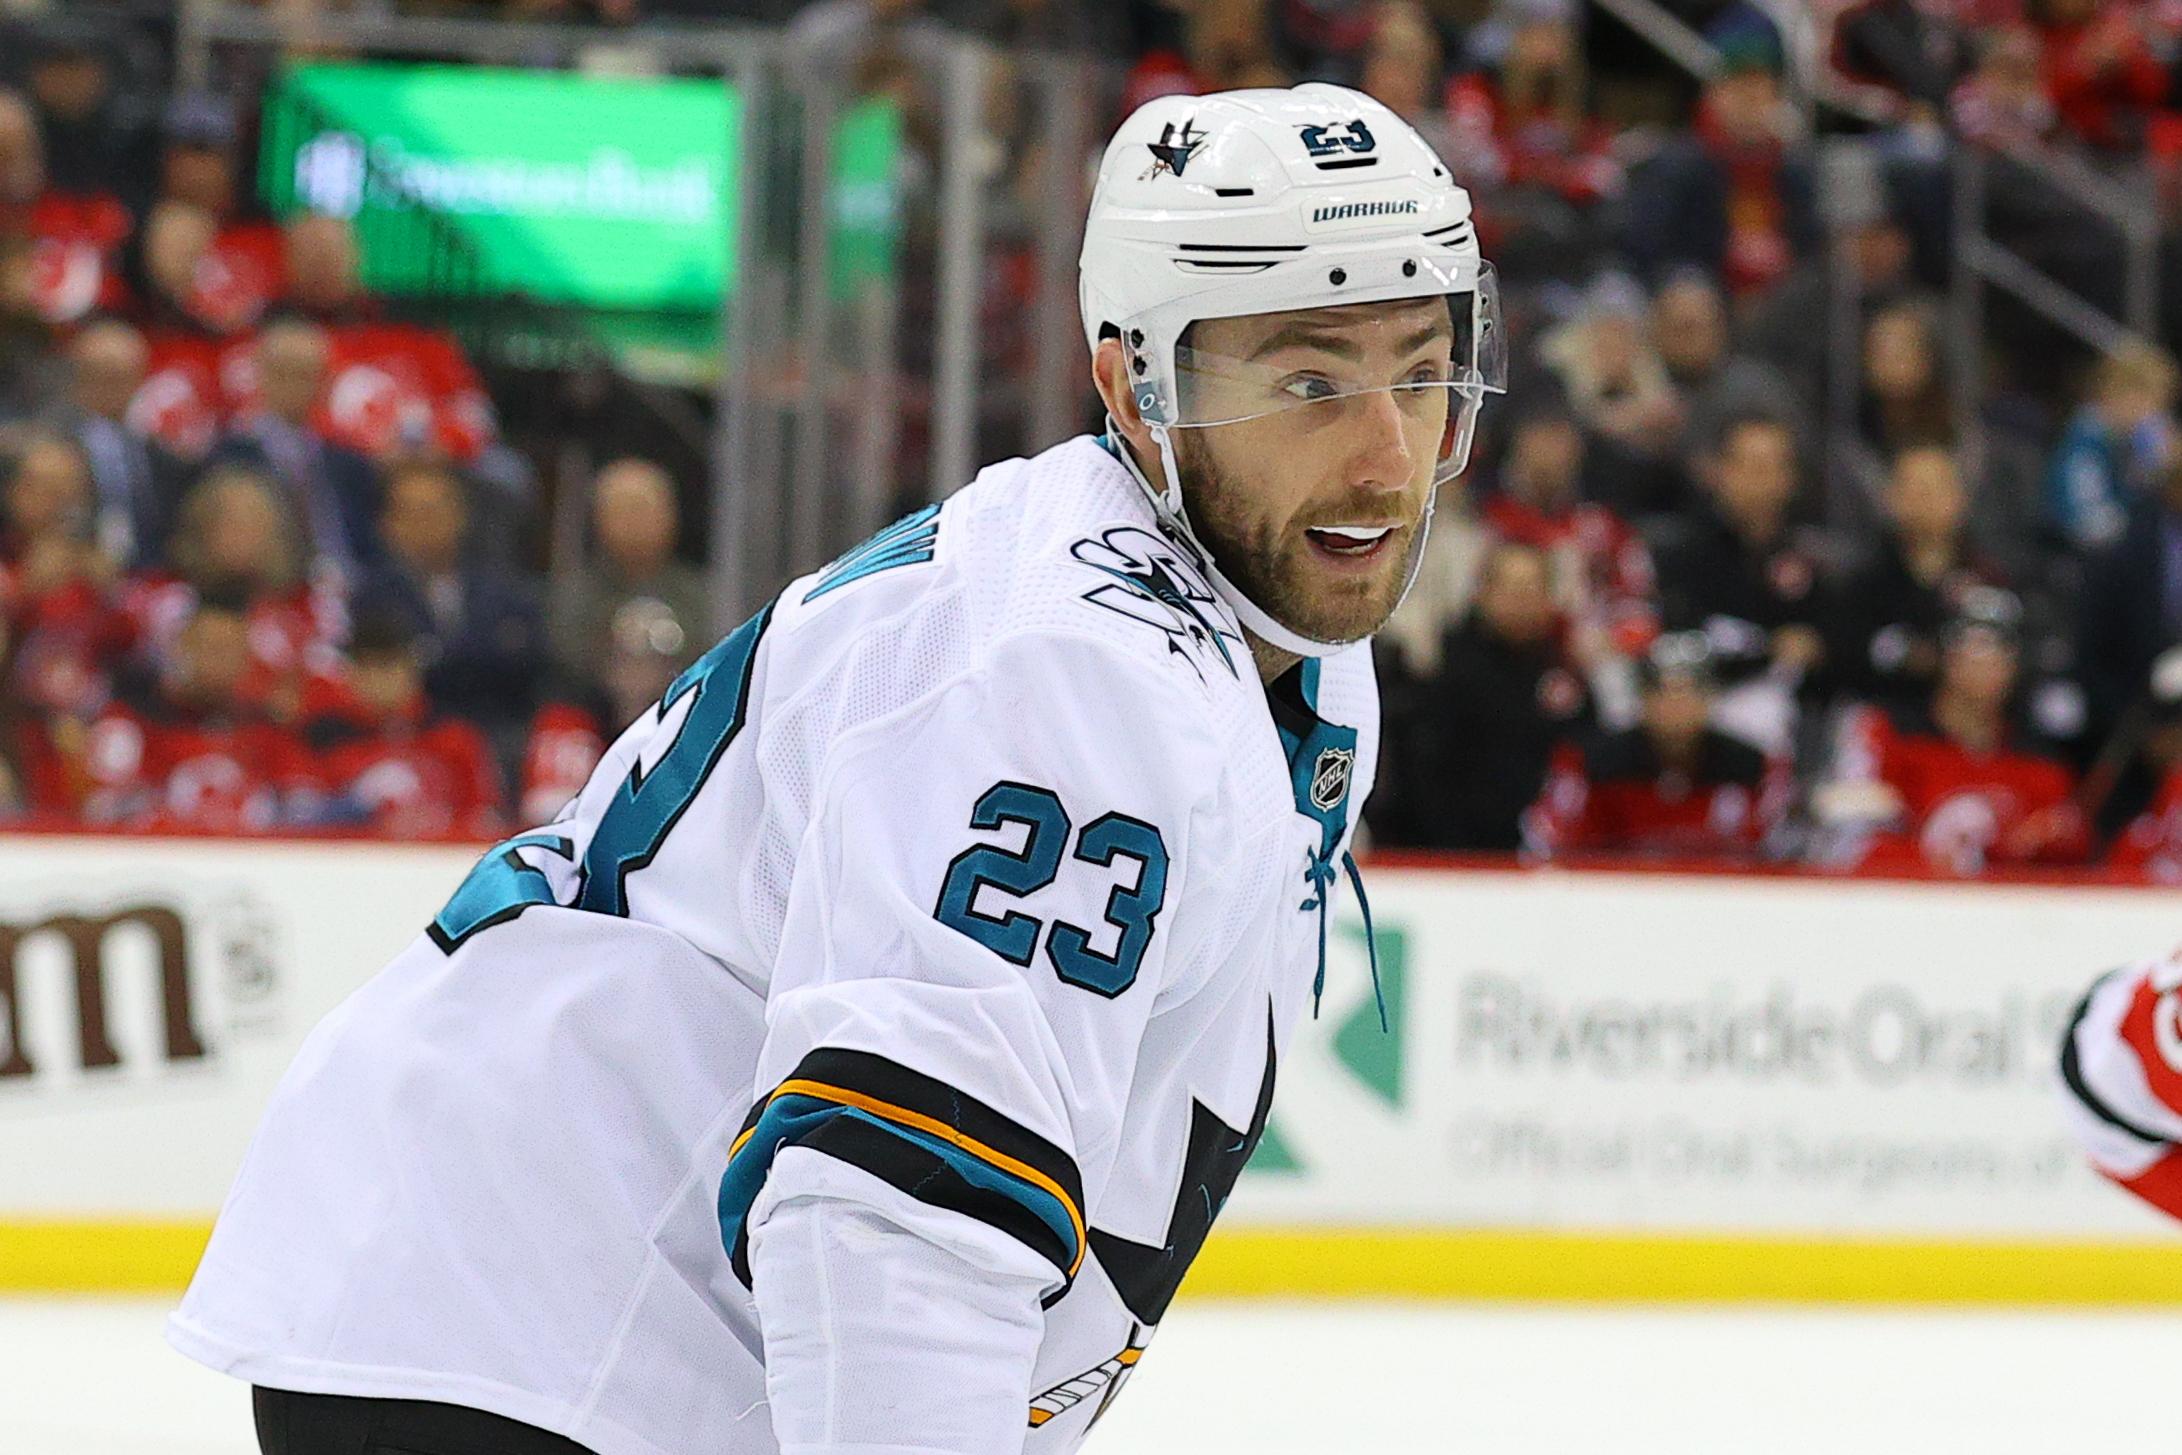 NHL: FEB 20 Sharks at Devils